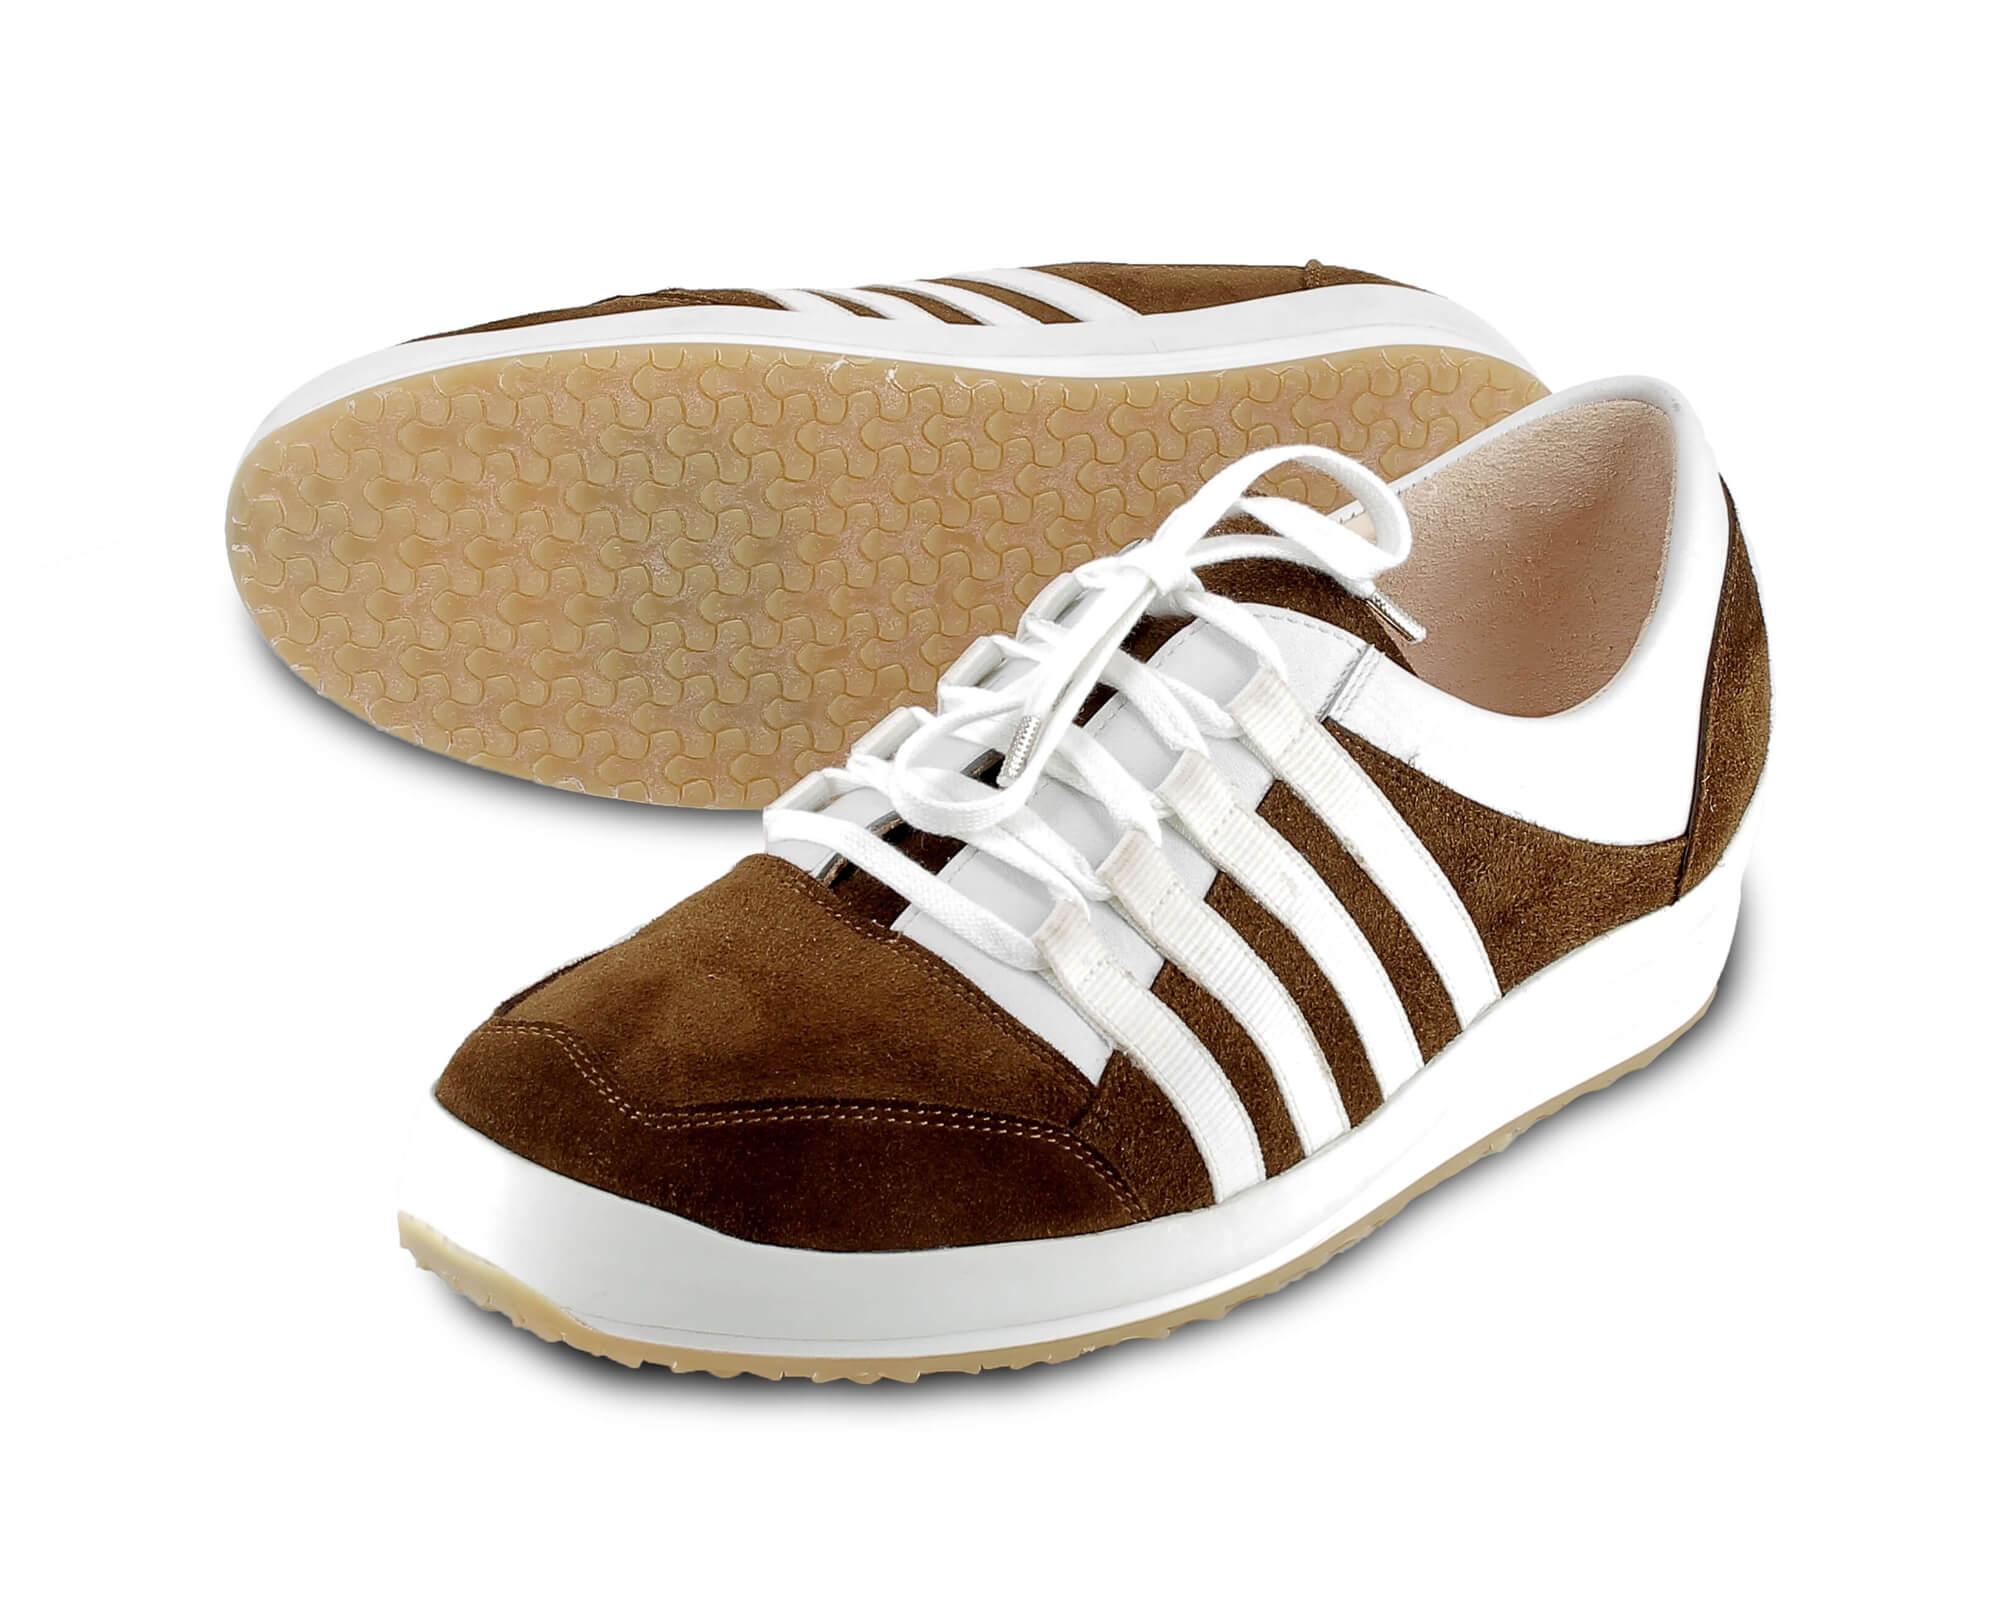 Maßschuh-Sneaker-flach-braun-weiß